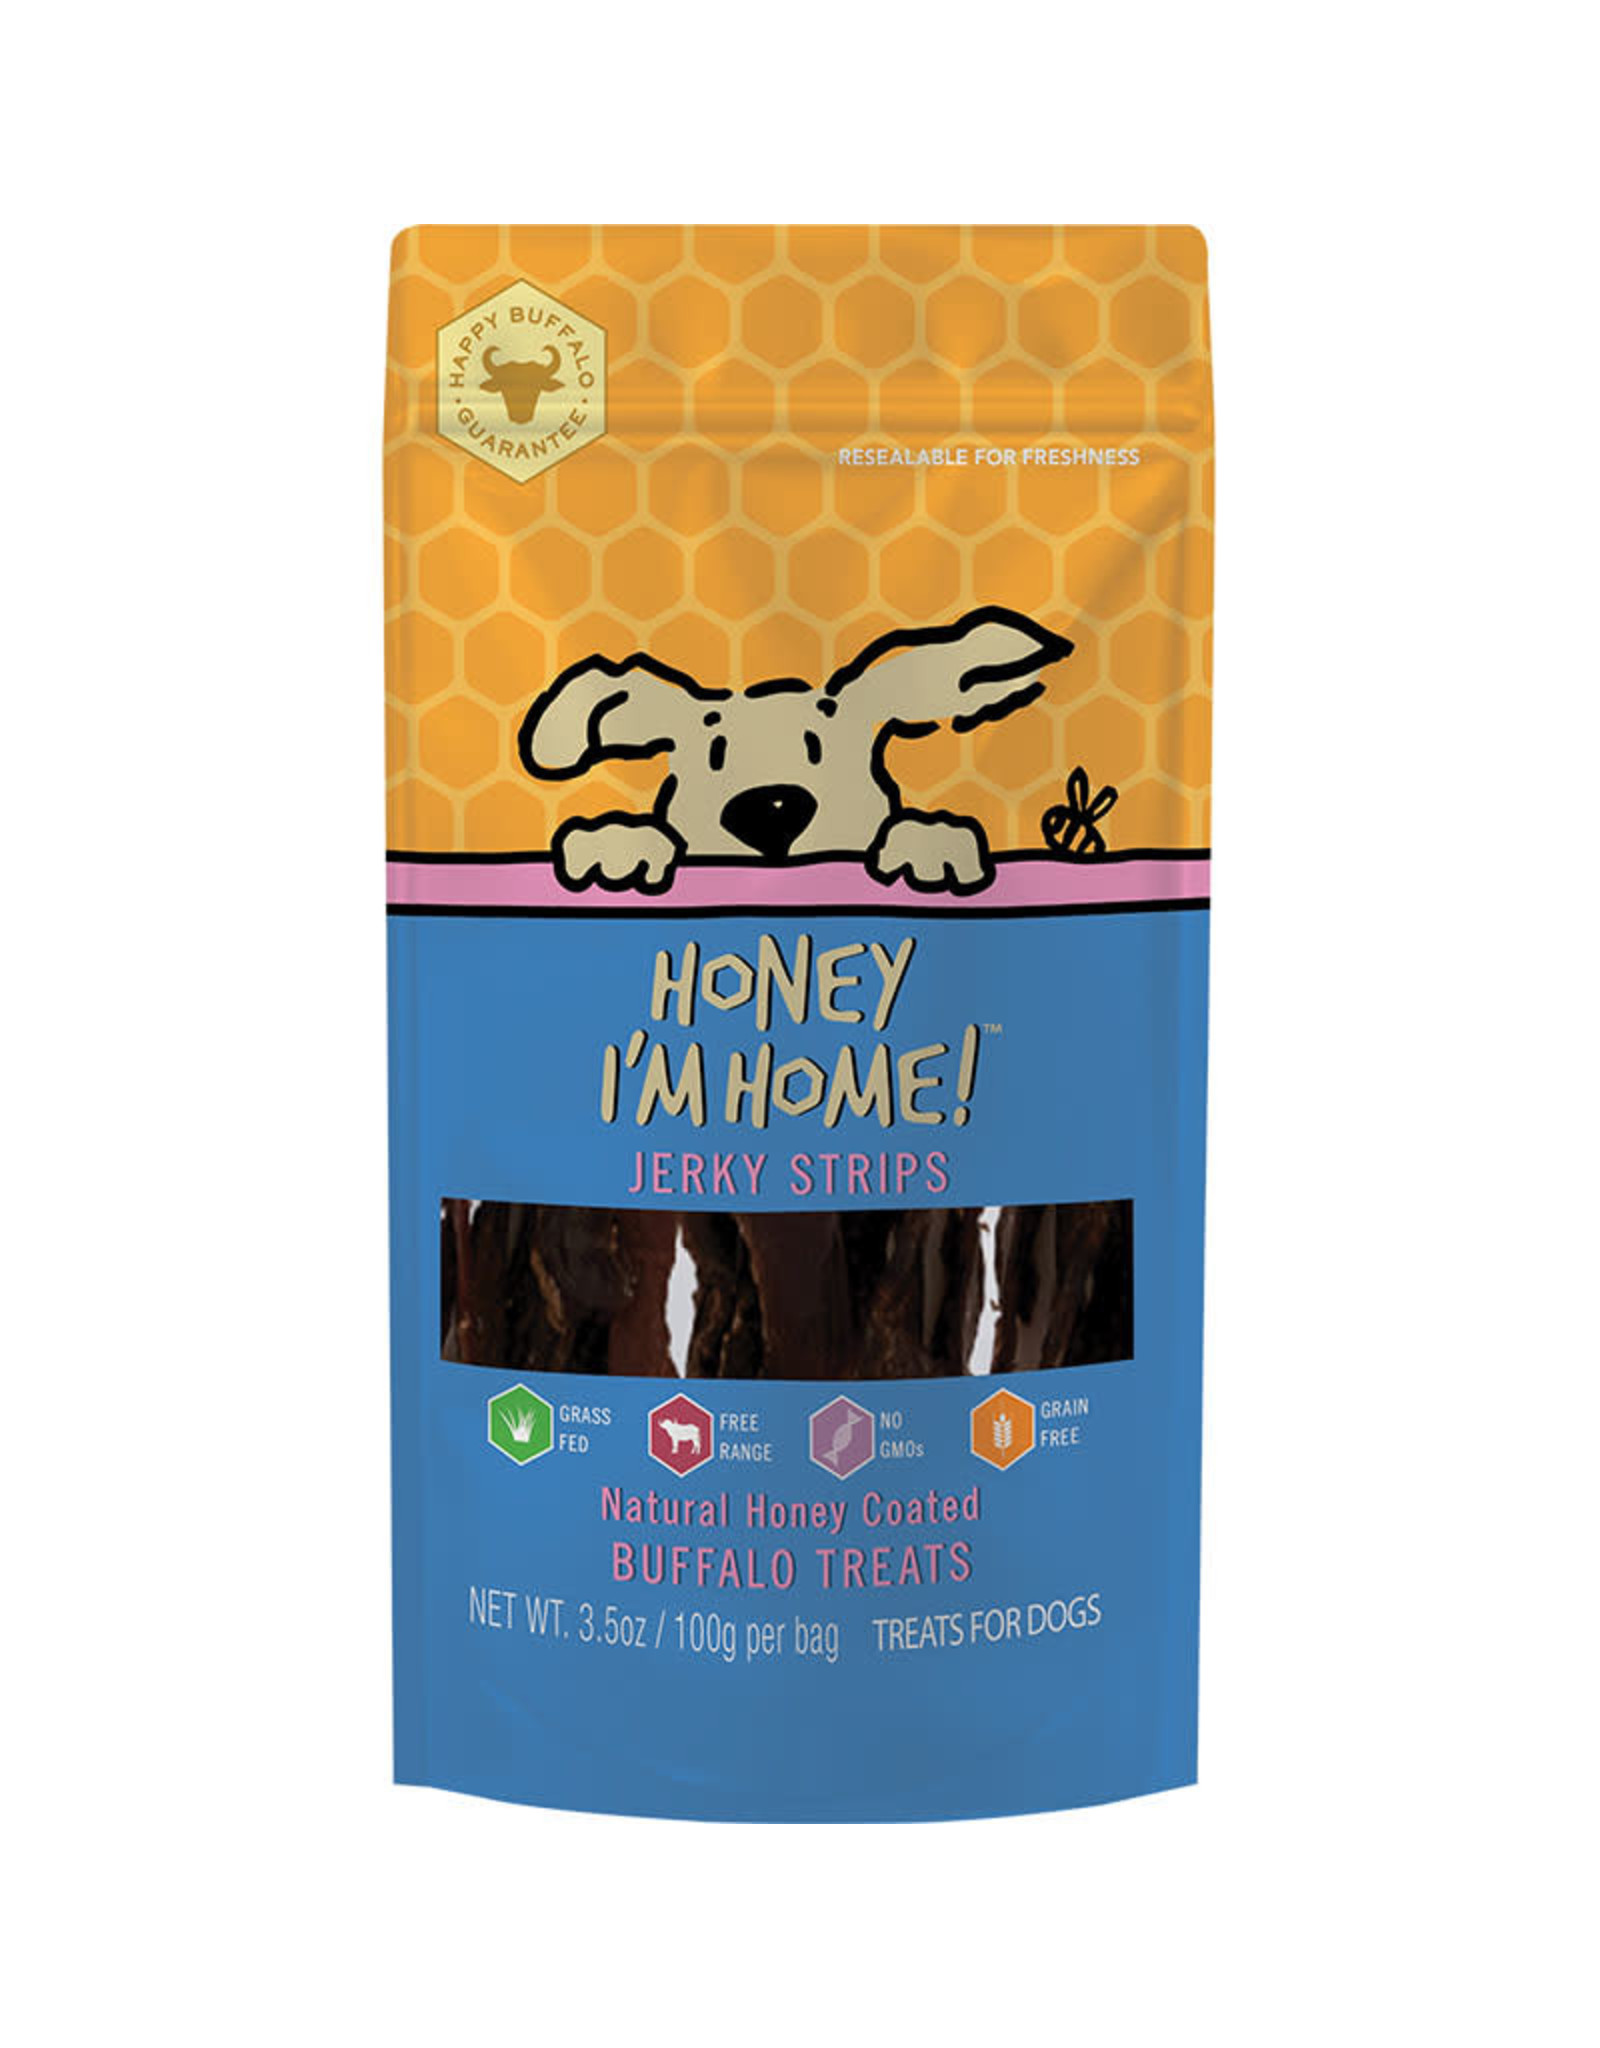 Honey I'm Home Honey I'm Home Buffalo Jerky Strips 3.5oz